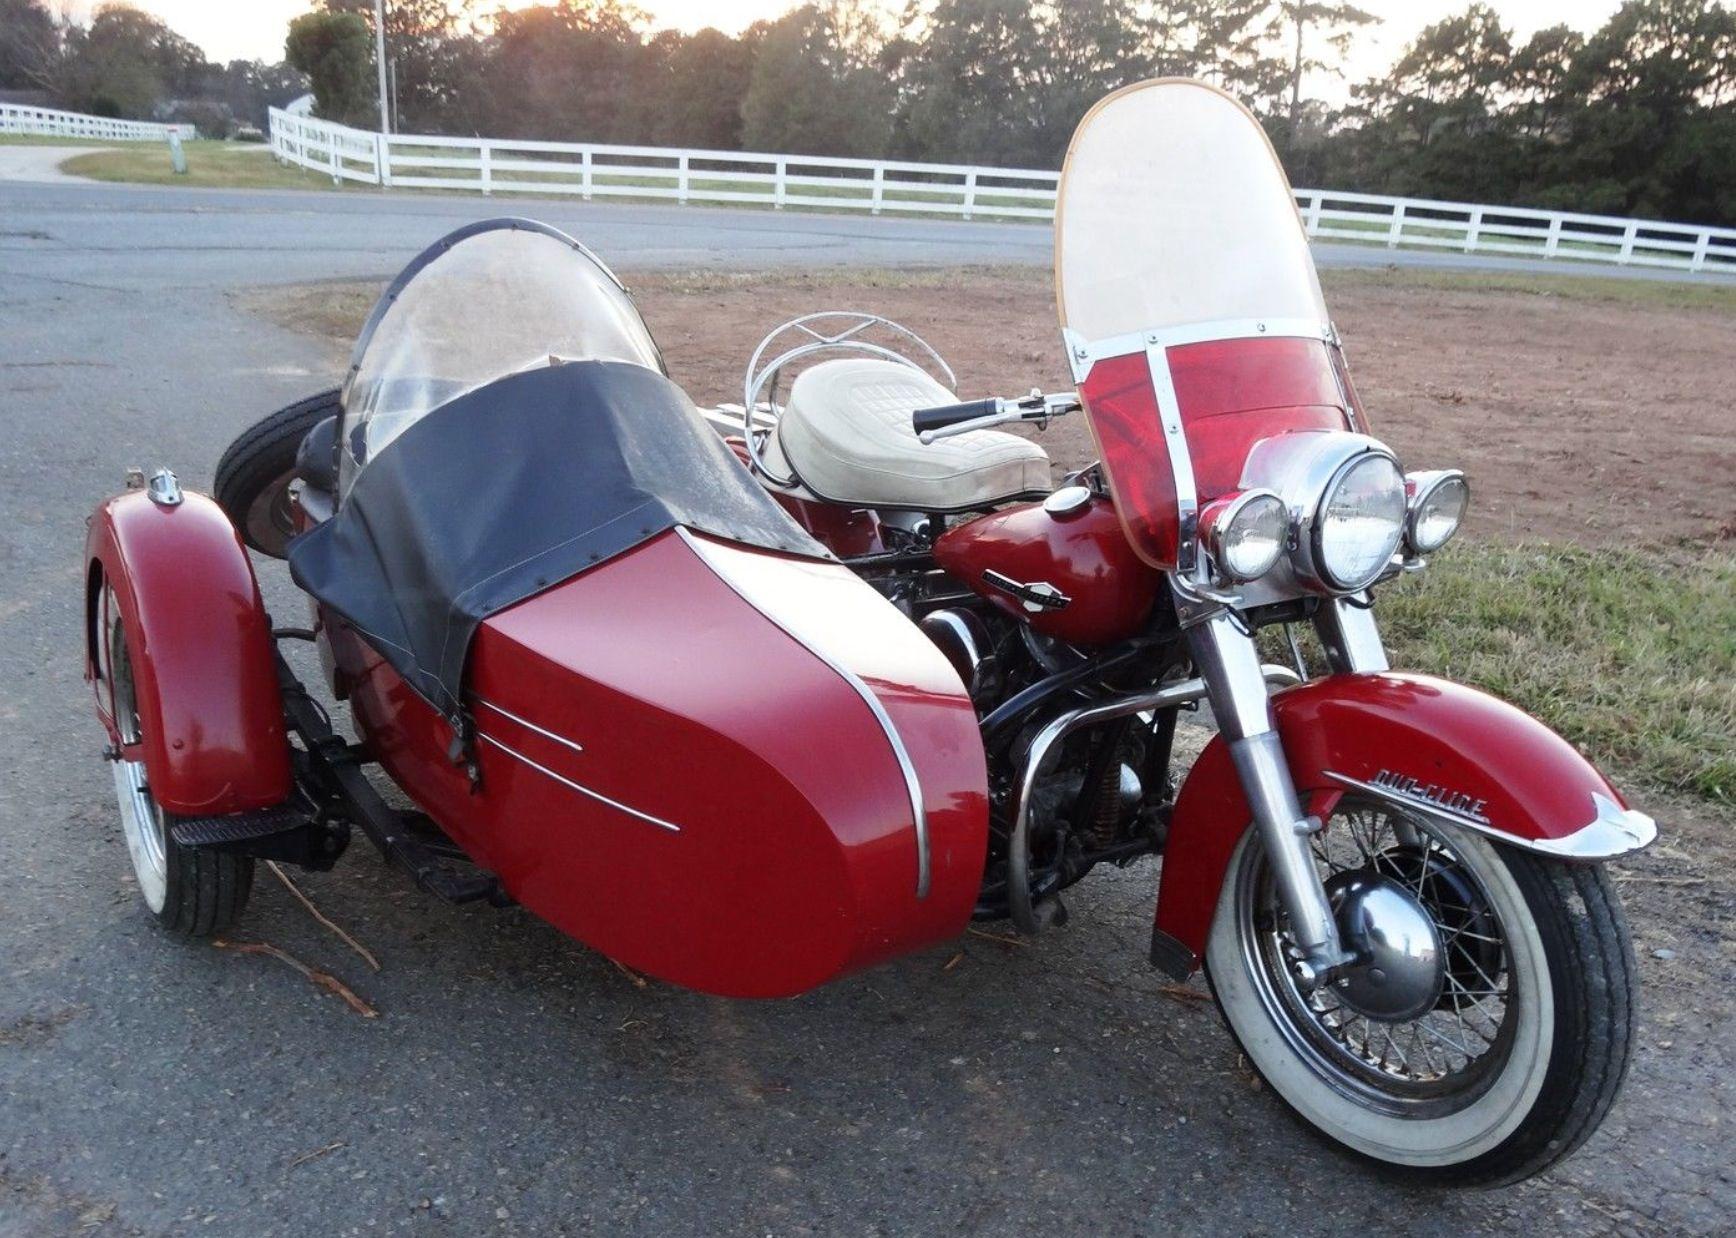 panhead sidecar rides sidecar harley davidson bike with sidecar rh pinterest com